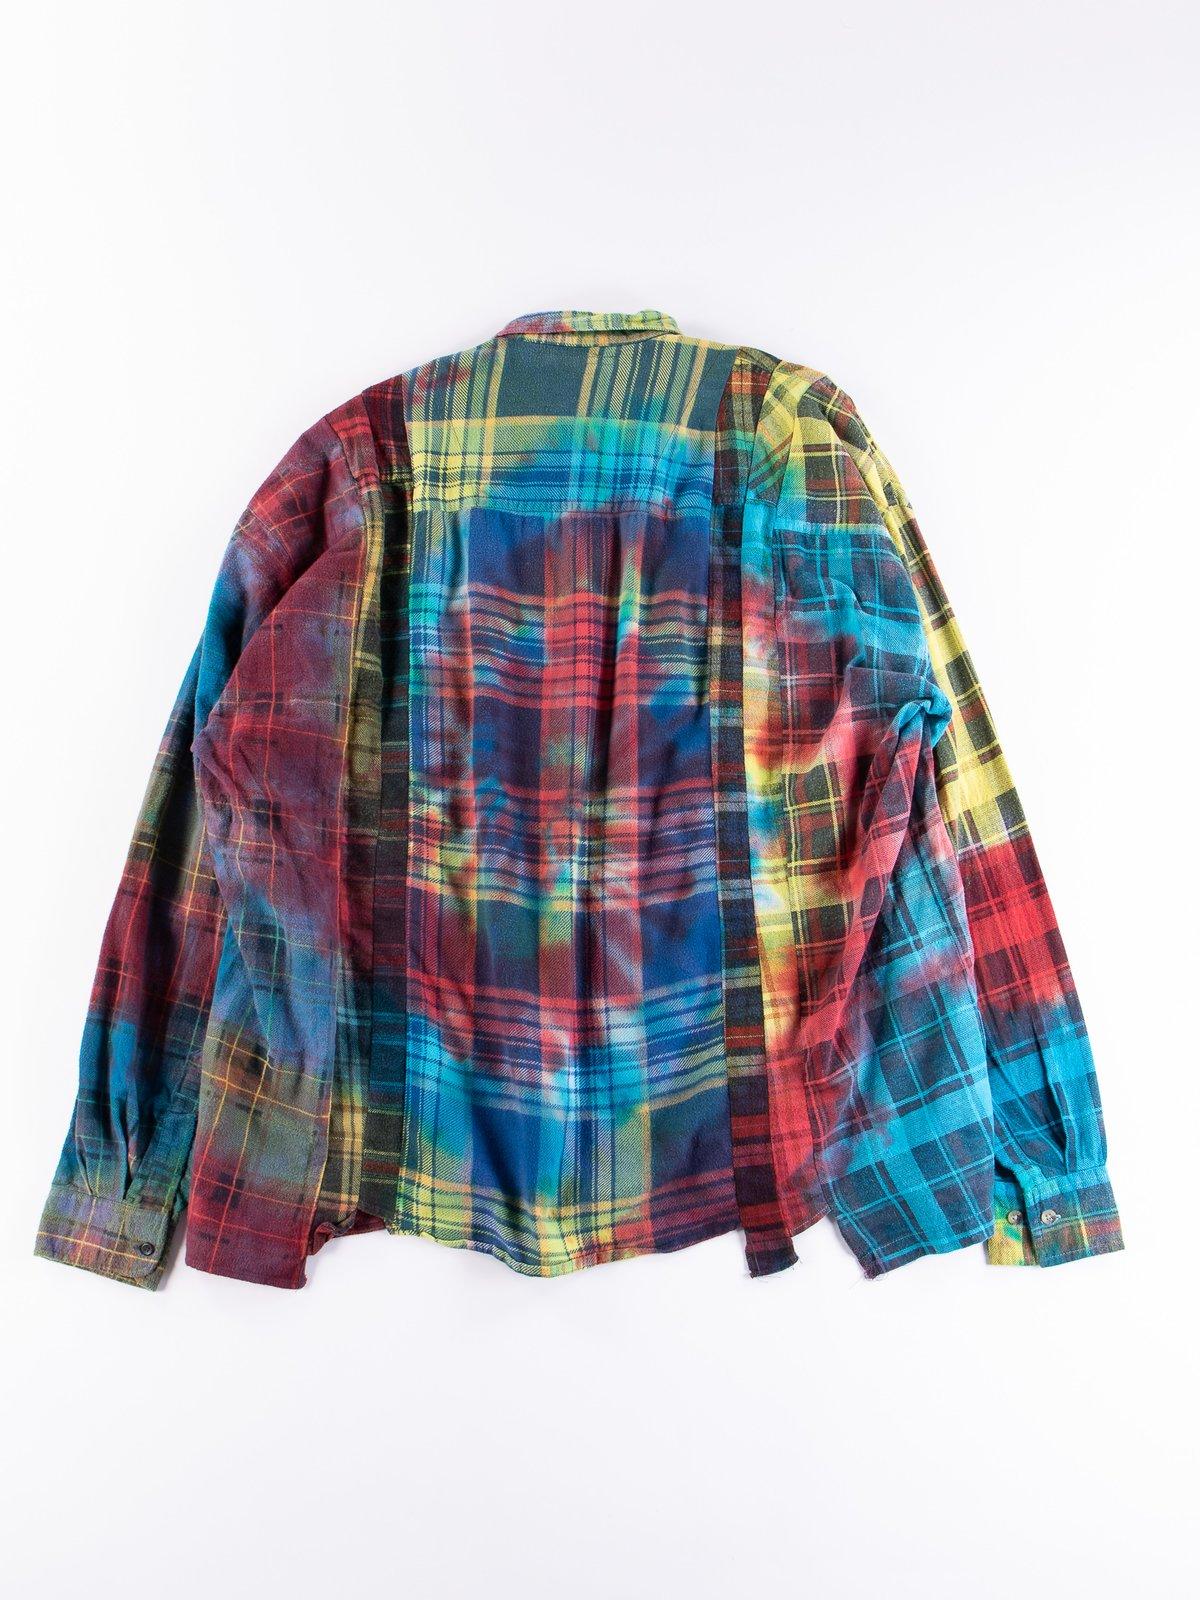 Tie Dye Assorted 7 Cuts Rebuild Shirt - Image 4